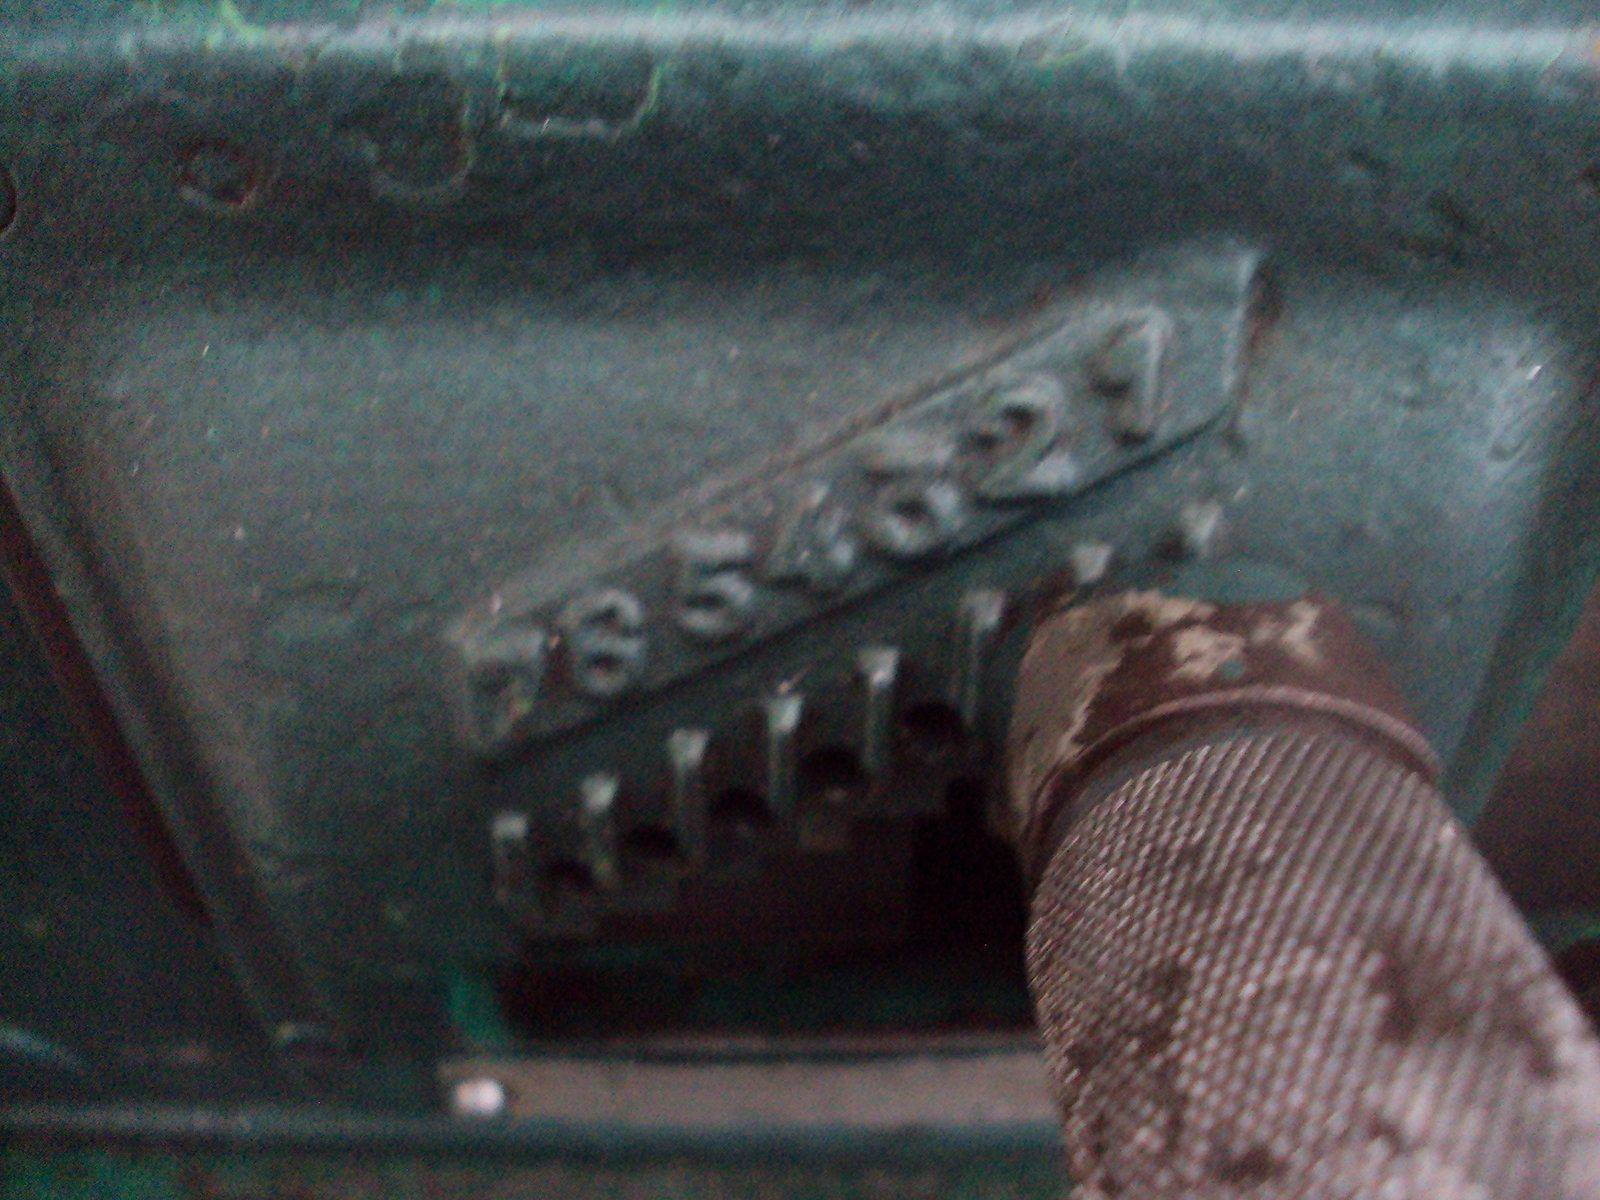 DSC05646.JPG